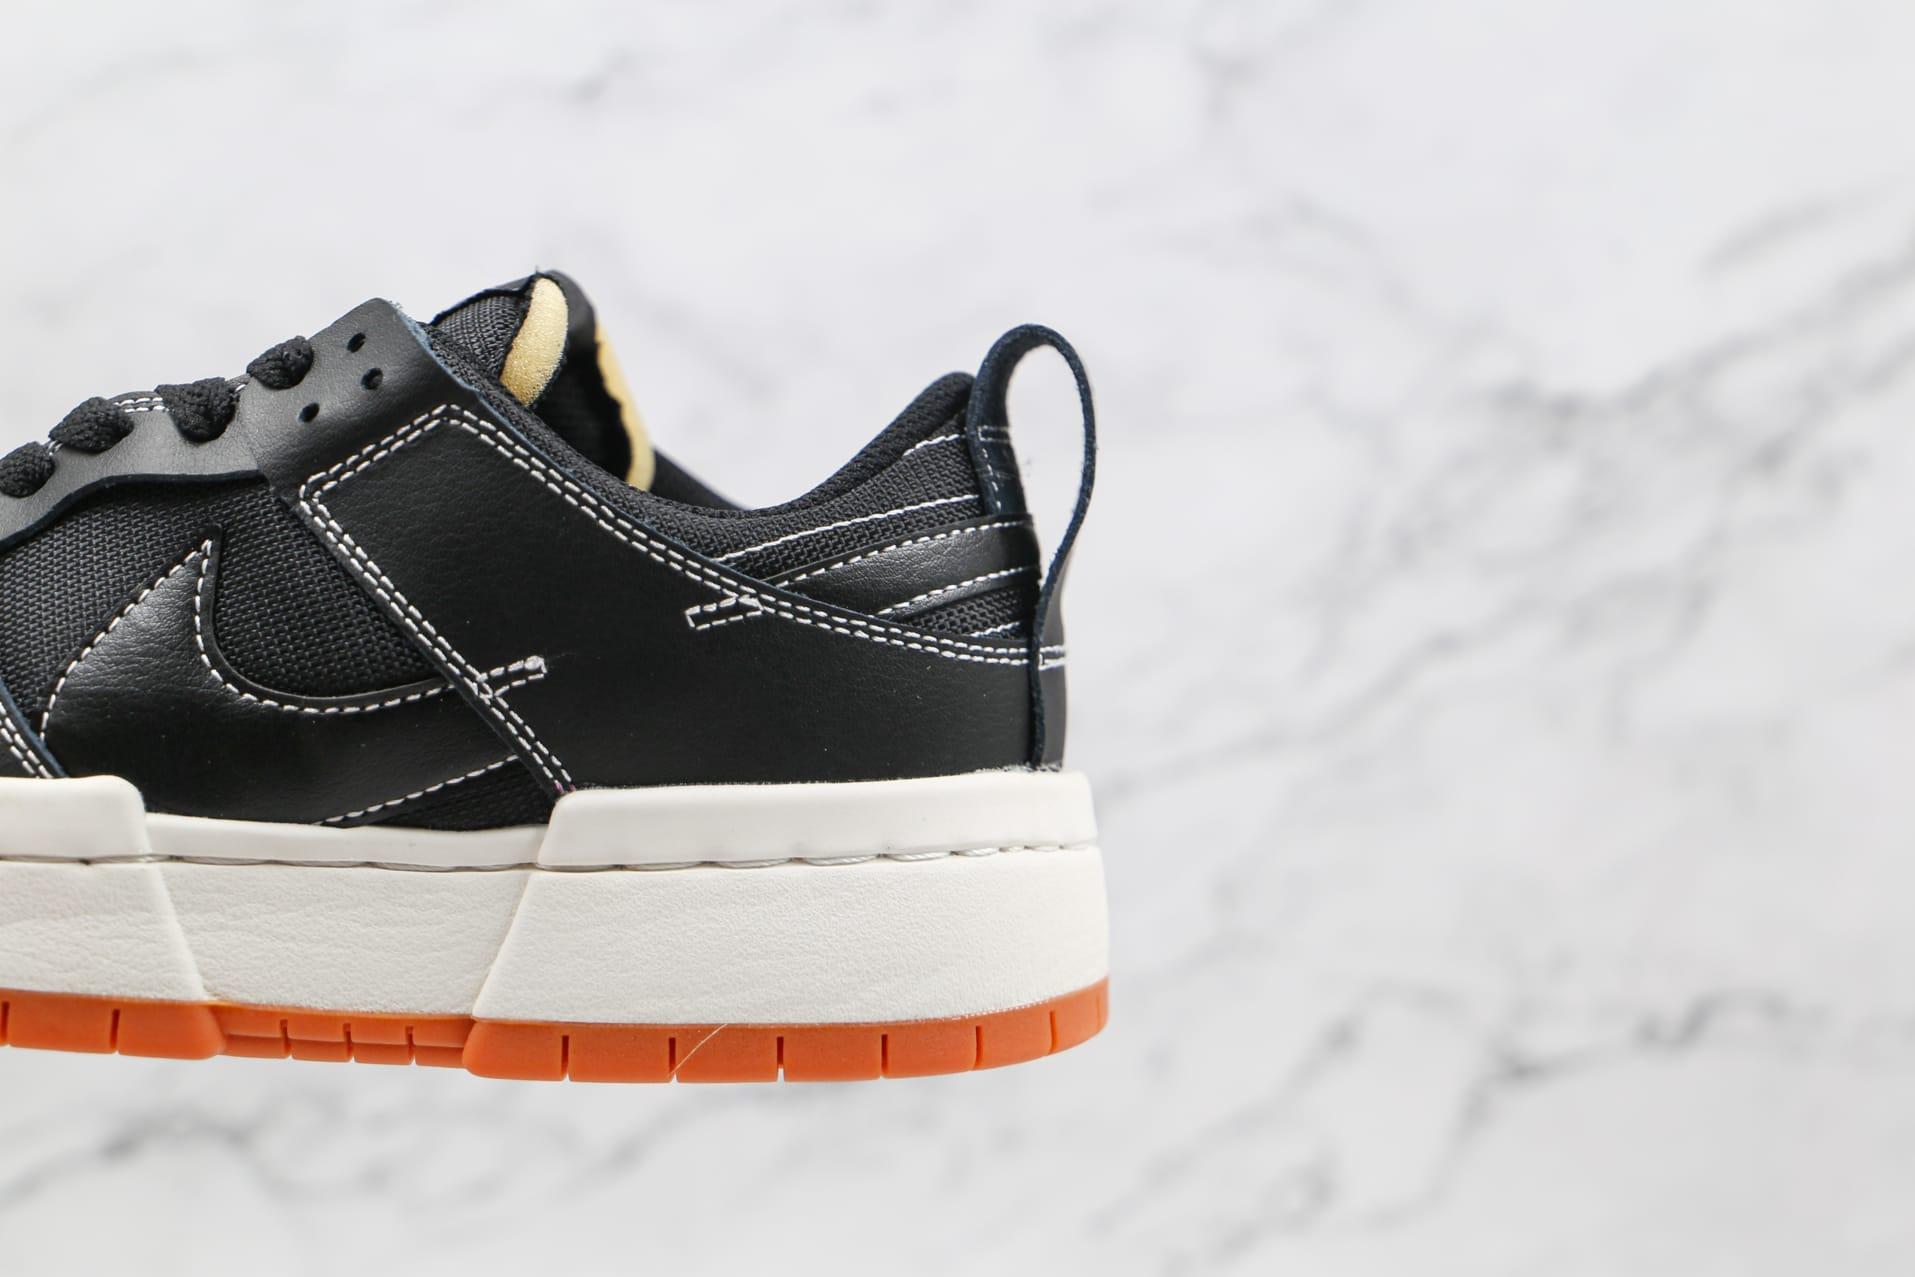 Nike Dunk Low Disrupt Black Gum W 4